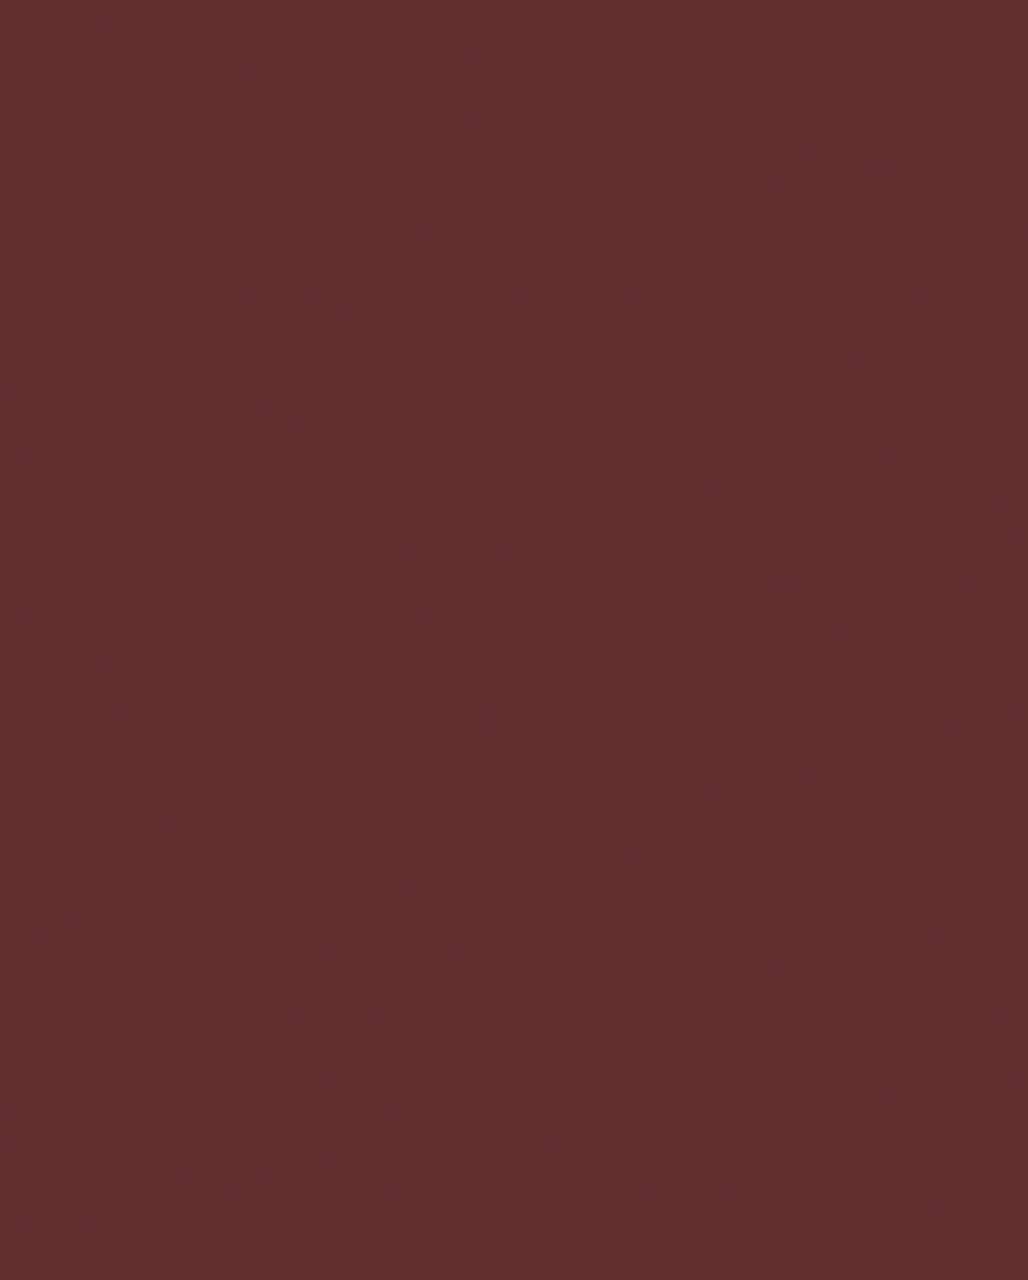 9551 Oxide Red (MF PB sample)